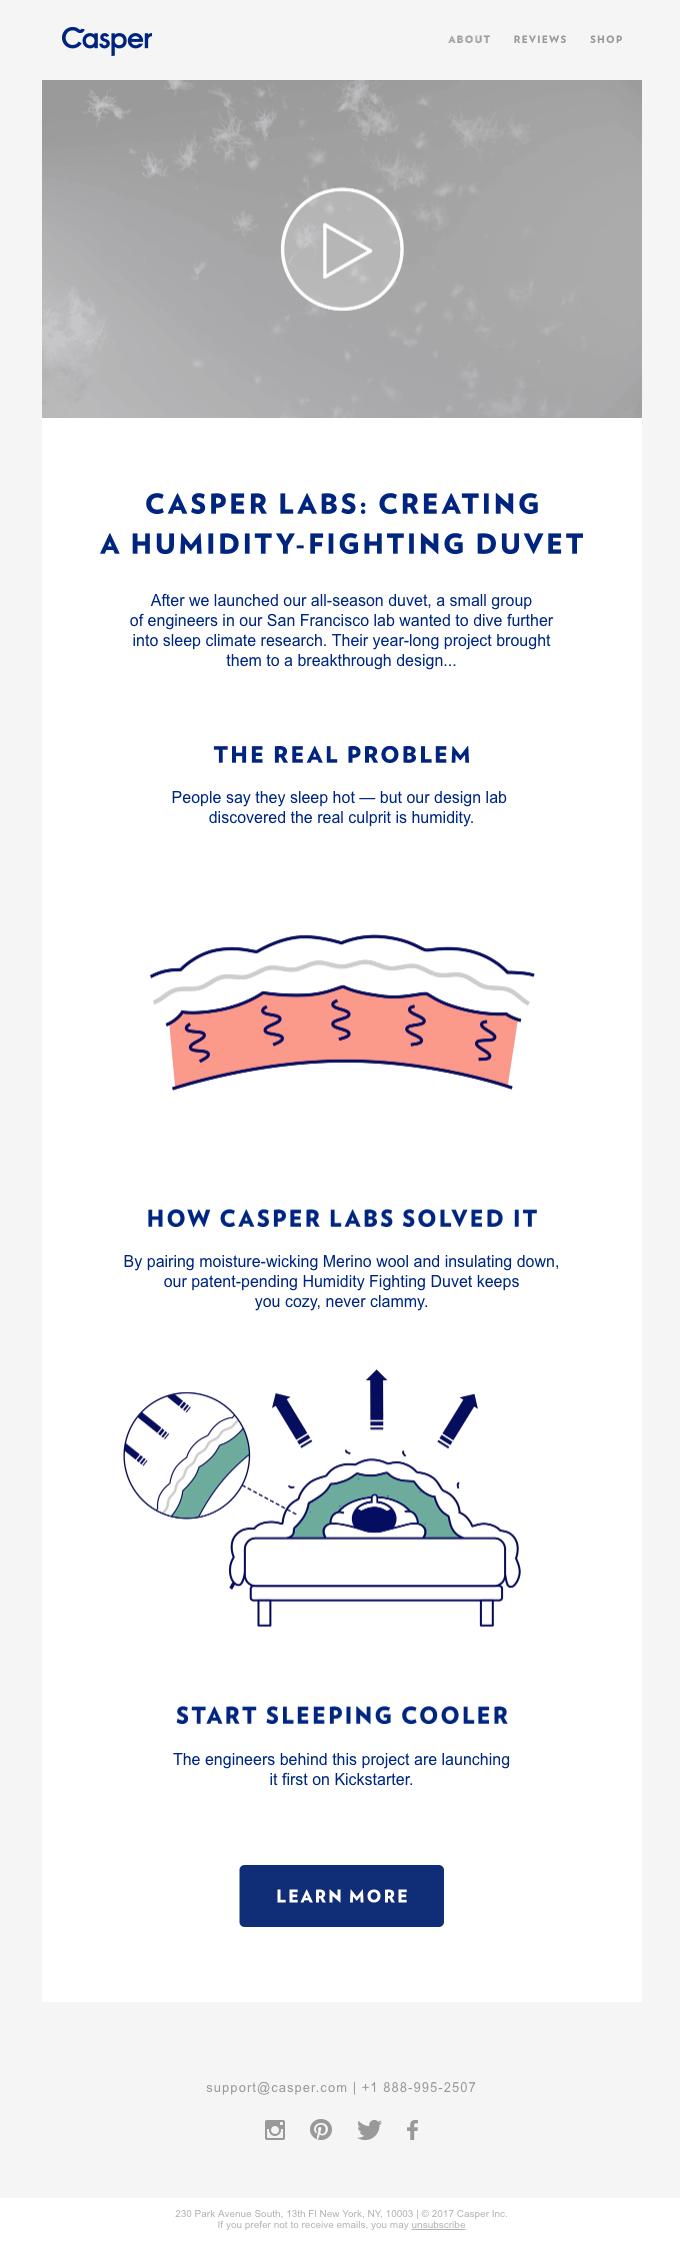 Casper Labs: Creating a Humidity-fighting Duvet